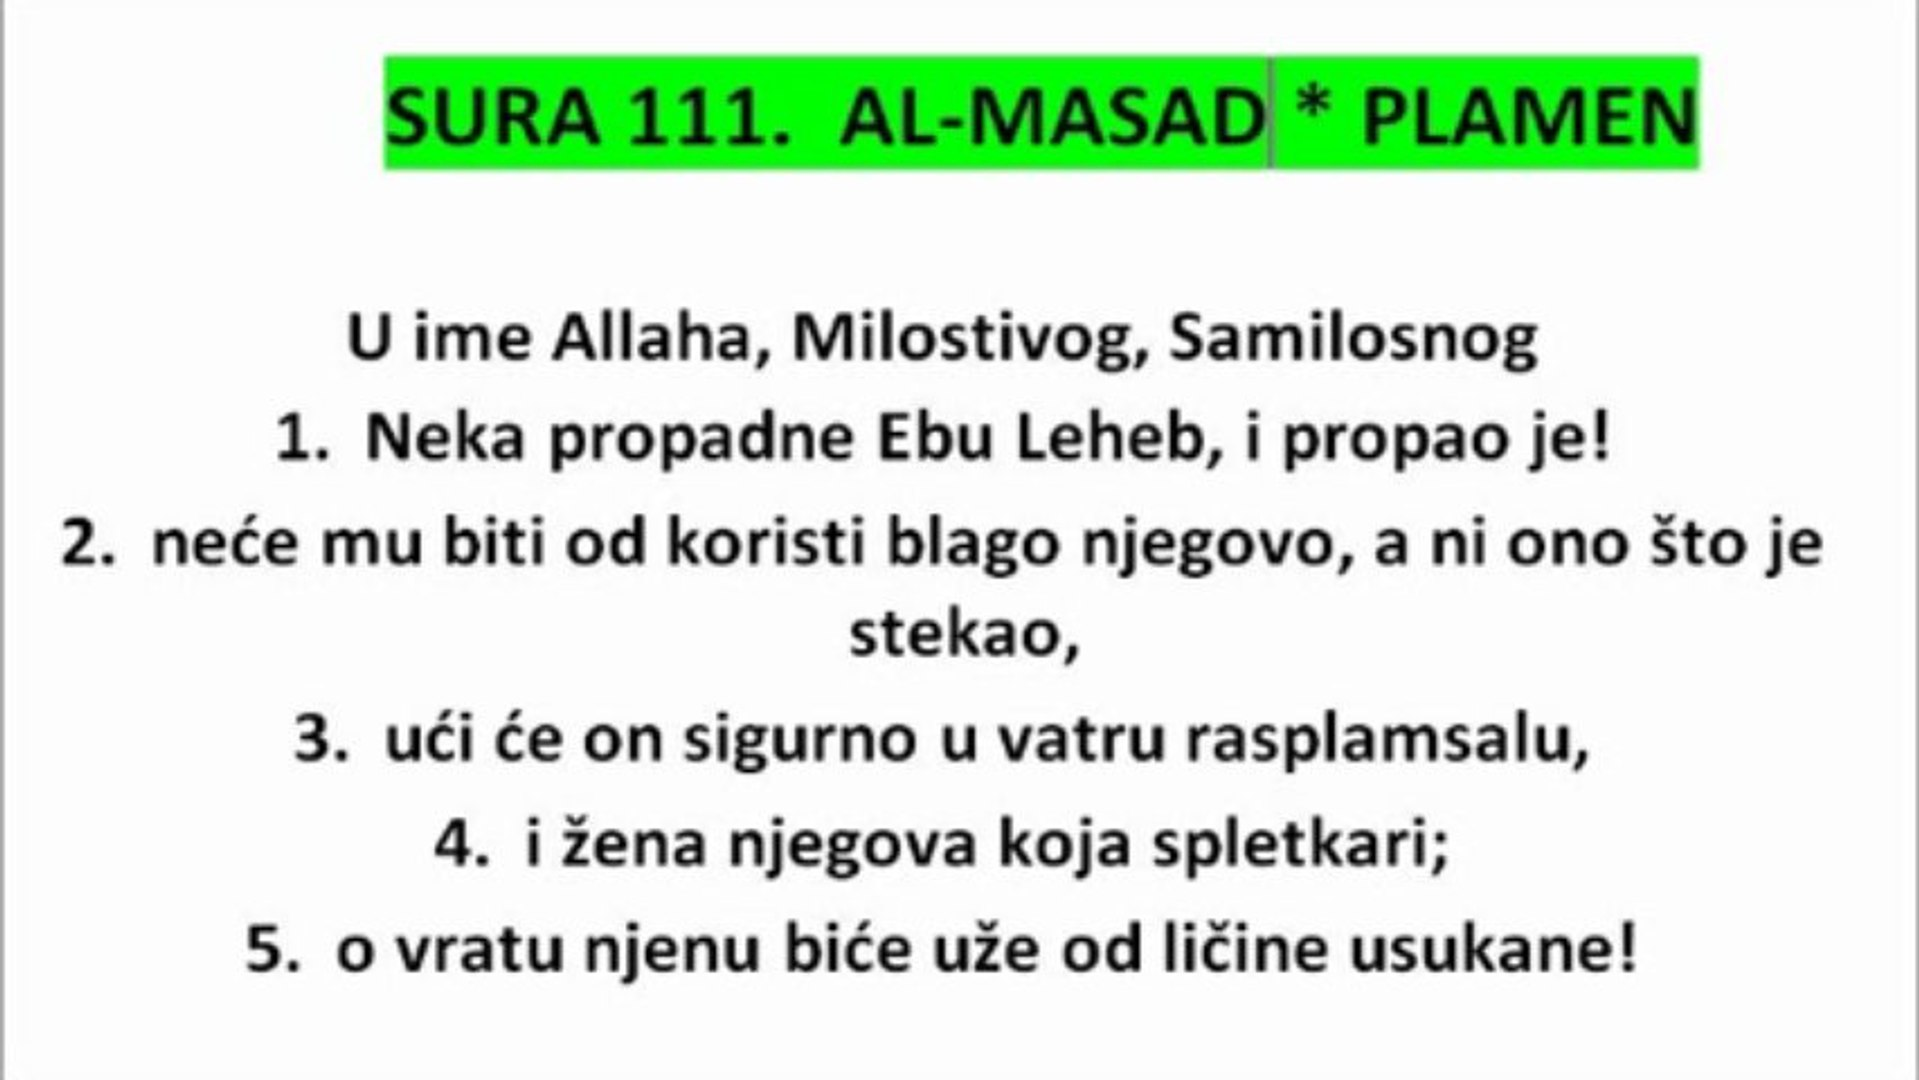 SURA 111: AL MASAD- PLAMEN-KUR'AN NA BOSANSKOM JEZIKU THE HOLY QUR'AN IN BOSNIAN